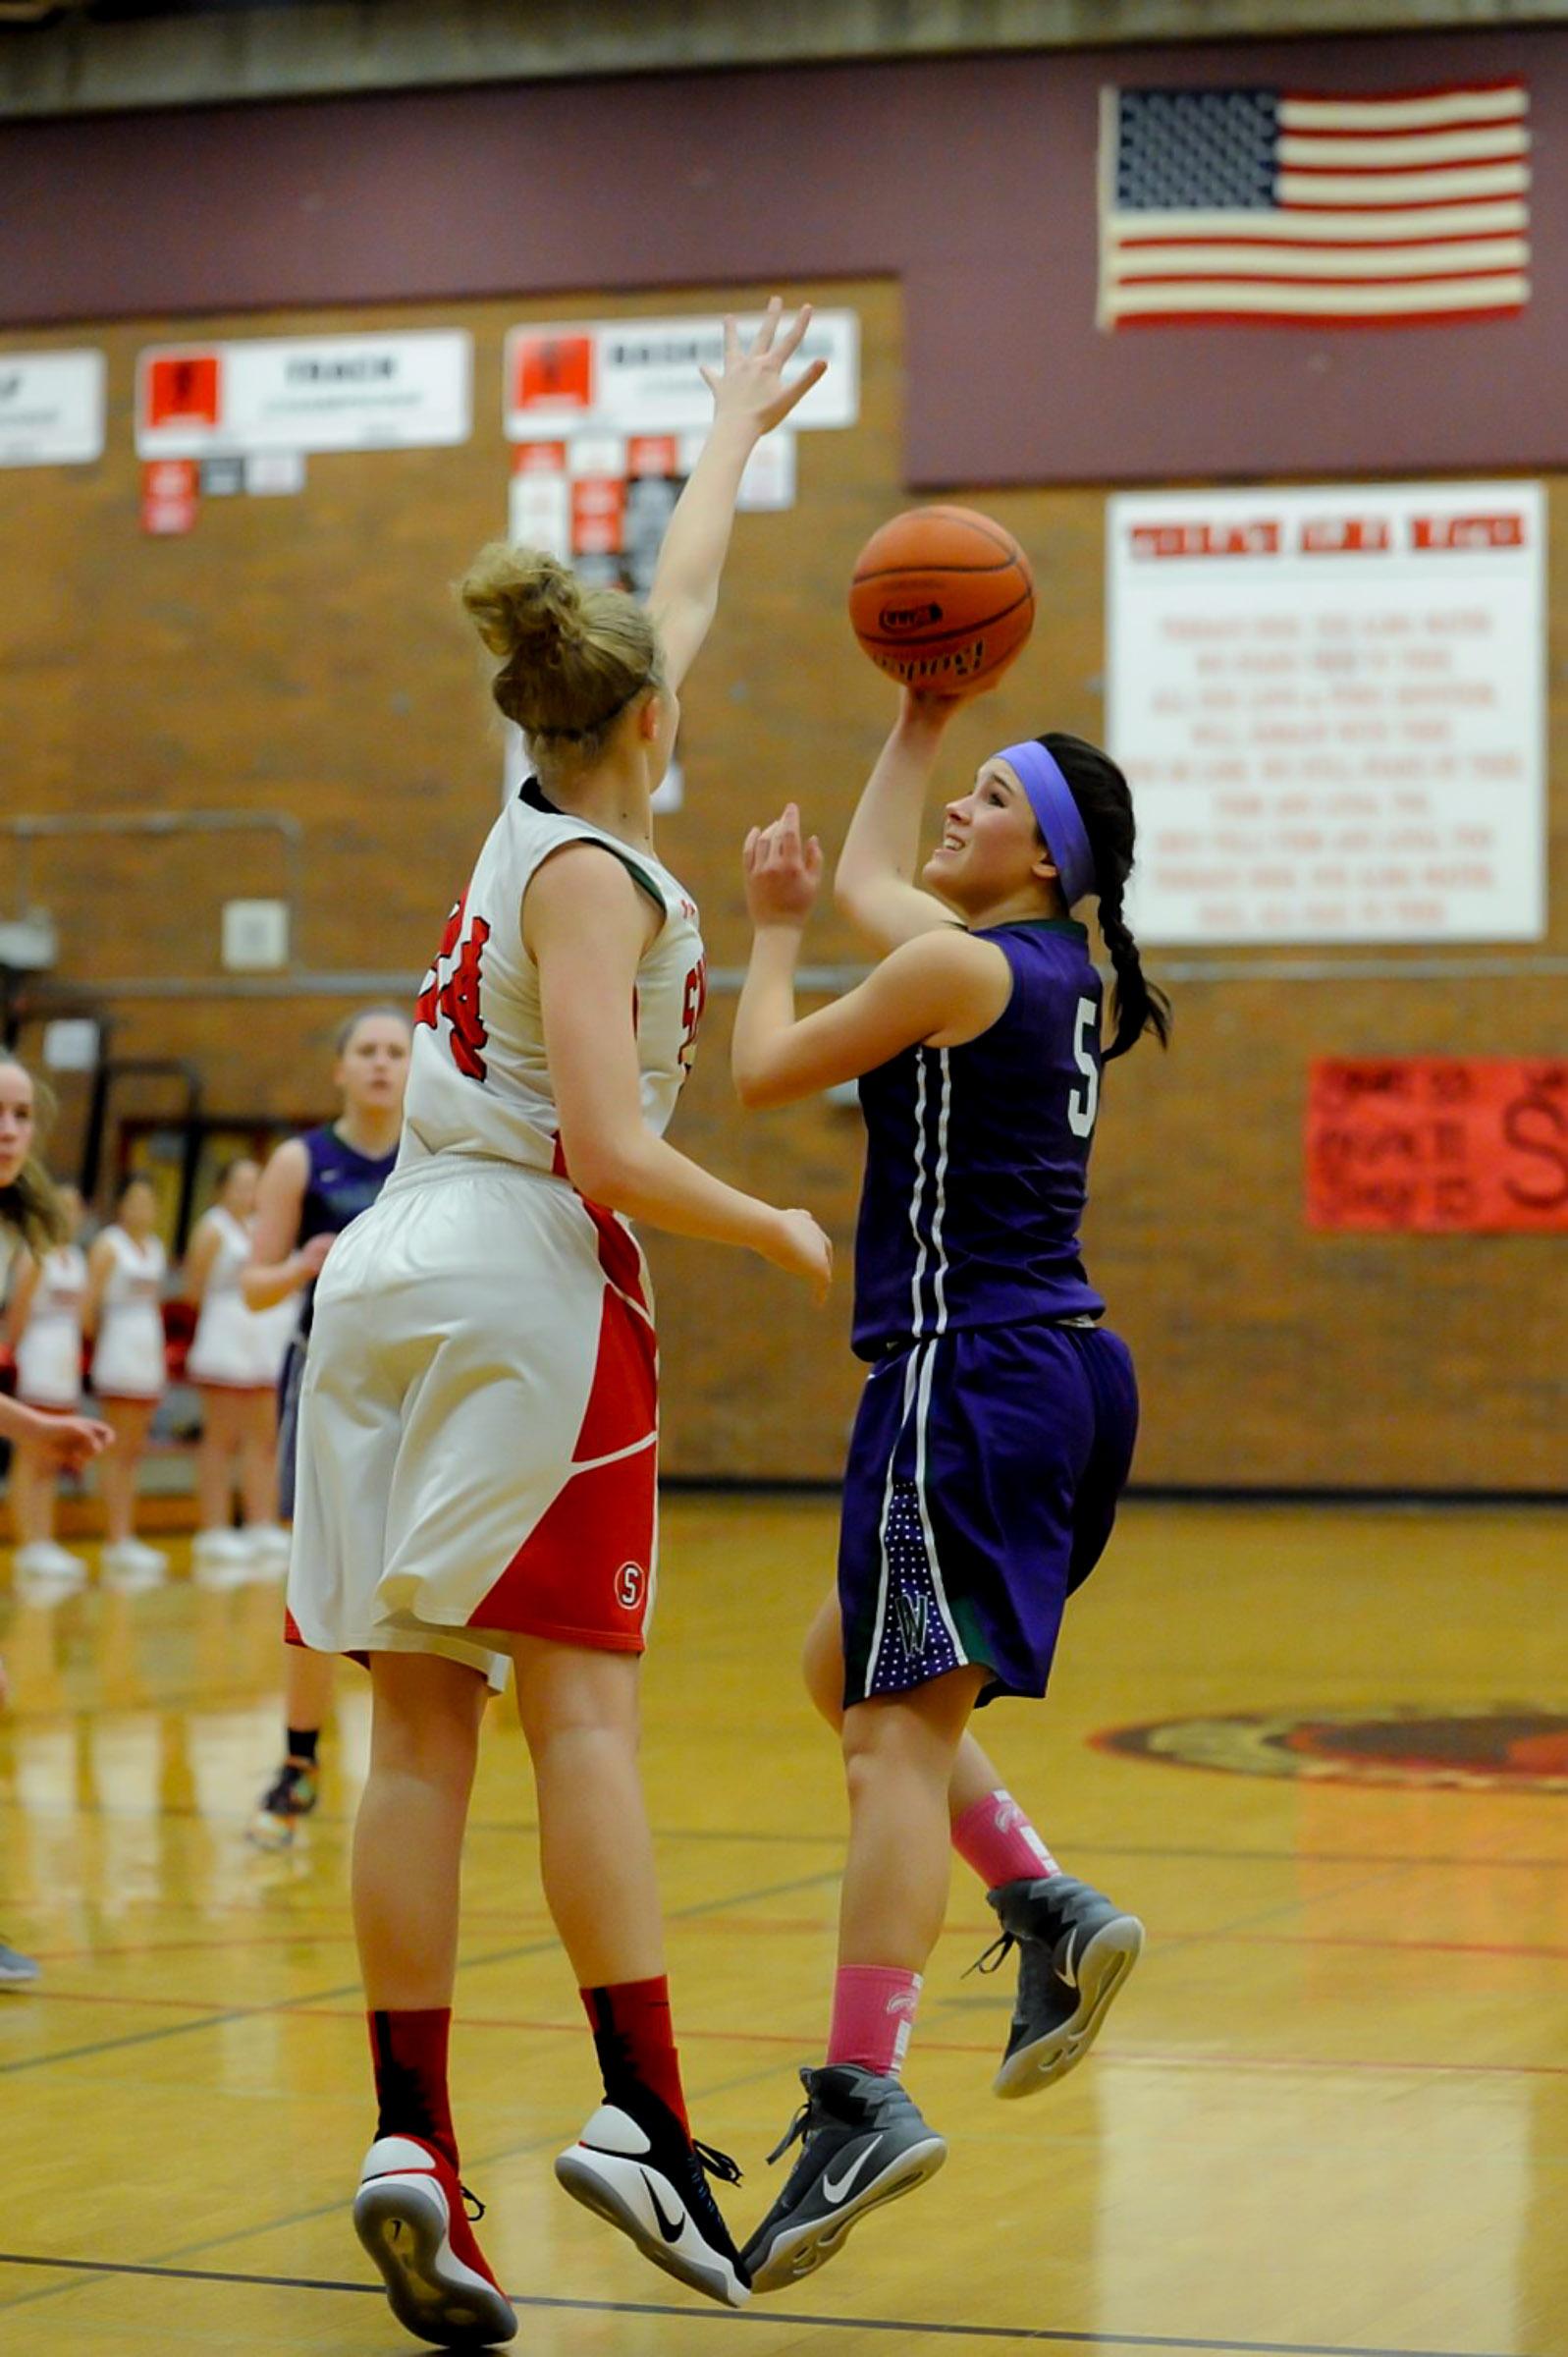 indsor girls basketball falls - HD1597×2400